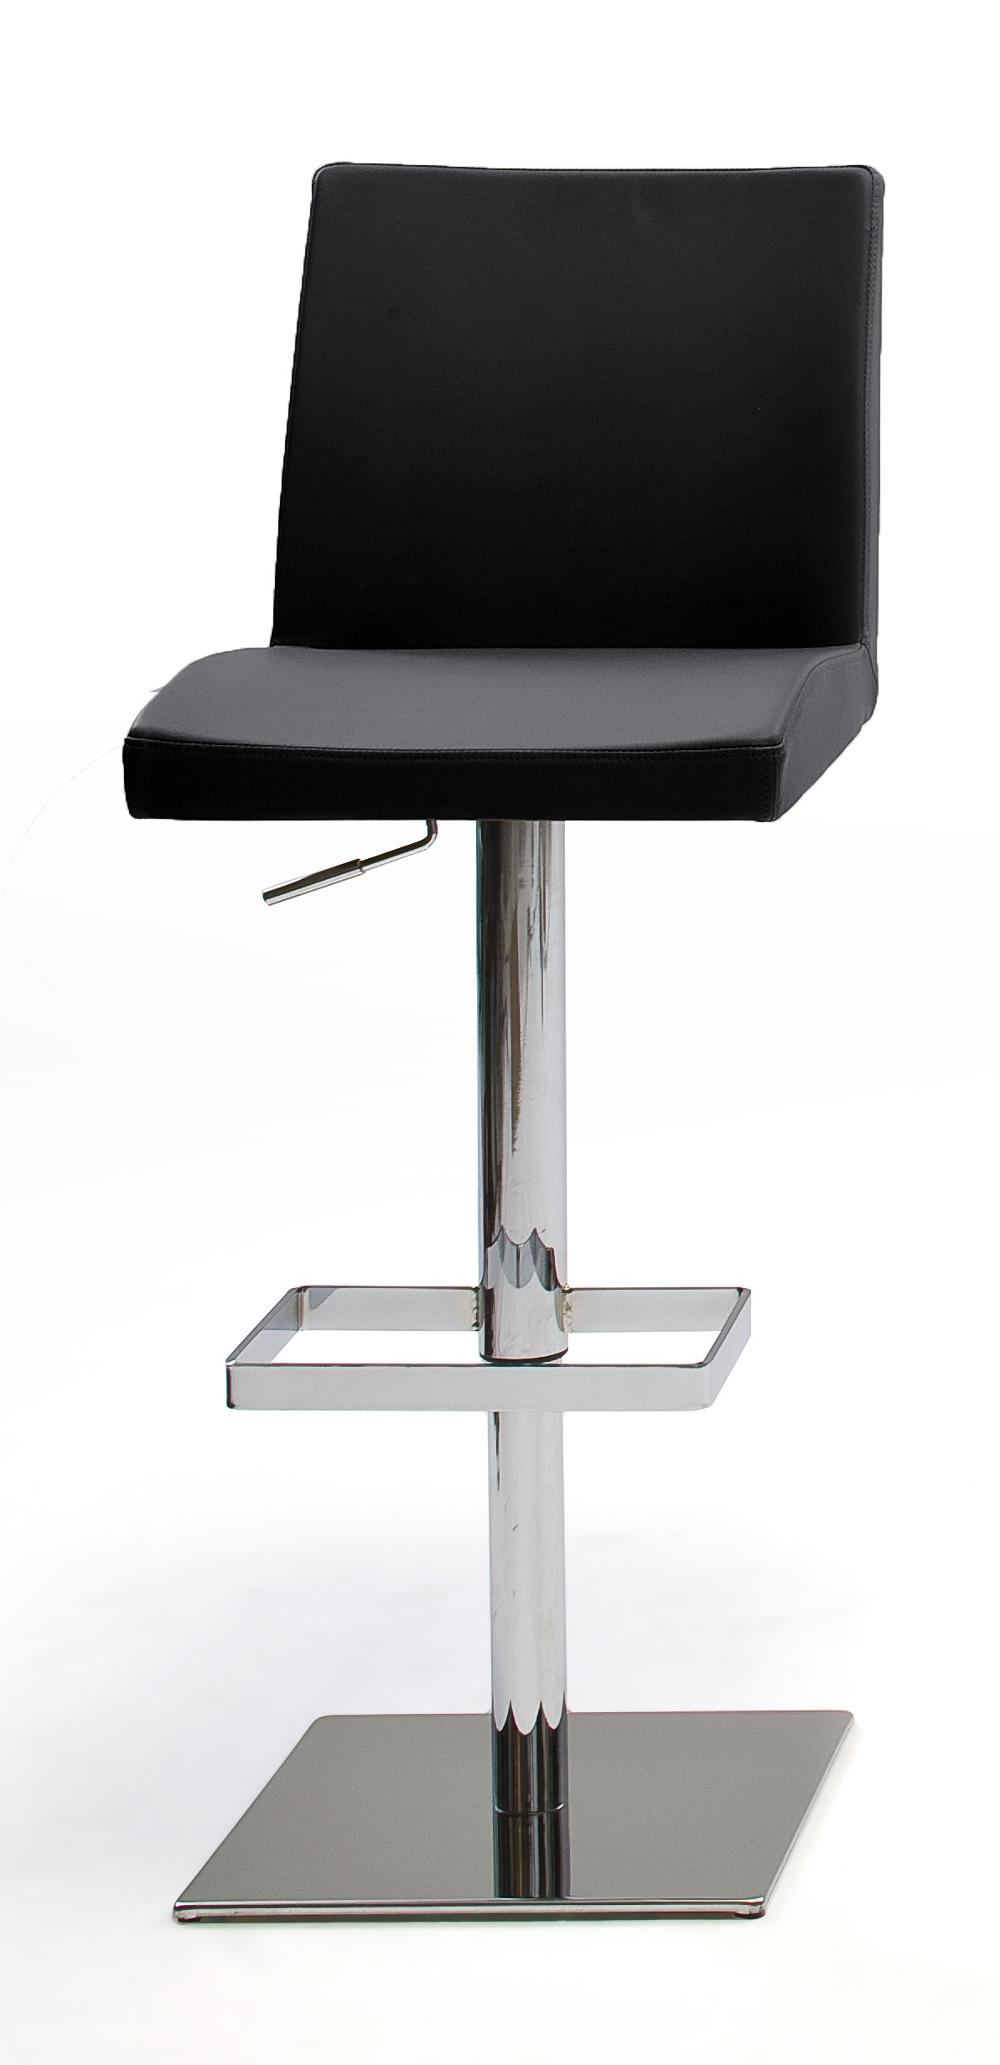 Robas lund stuhl barstuhl barhocker vigo schwarz for Barhocker 92 cm